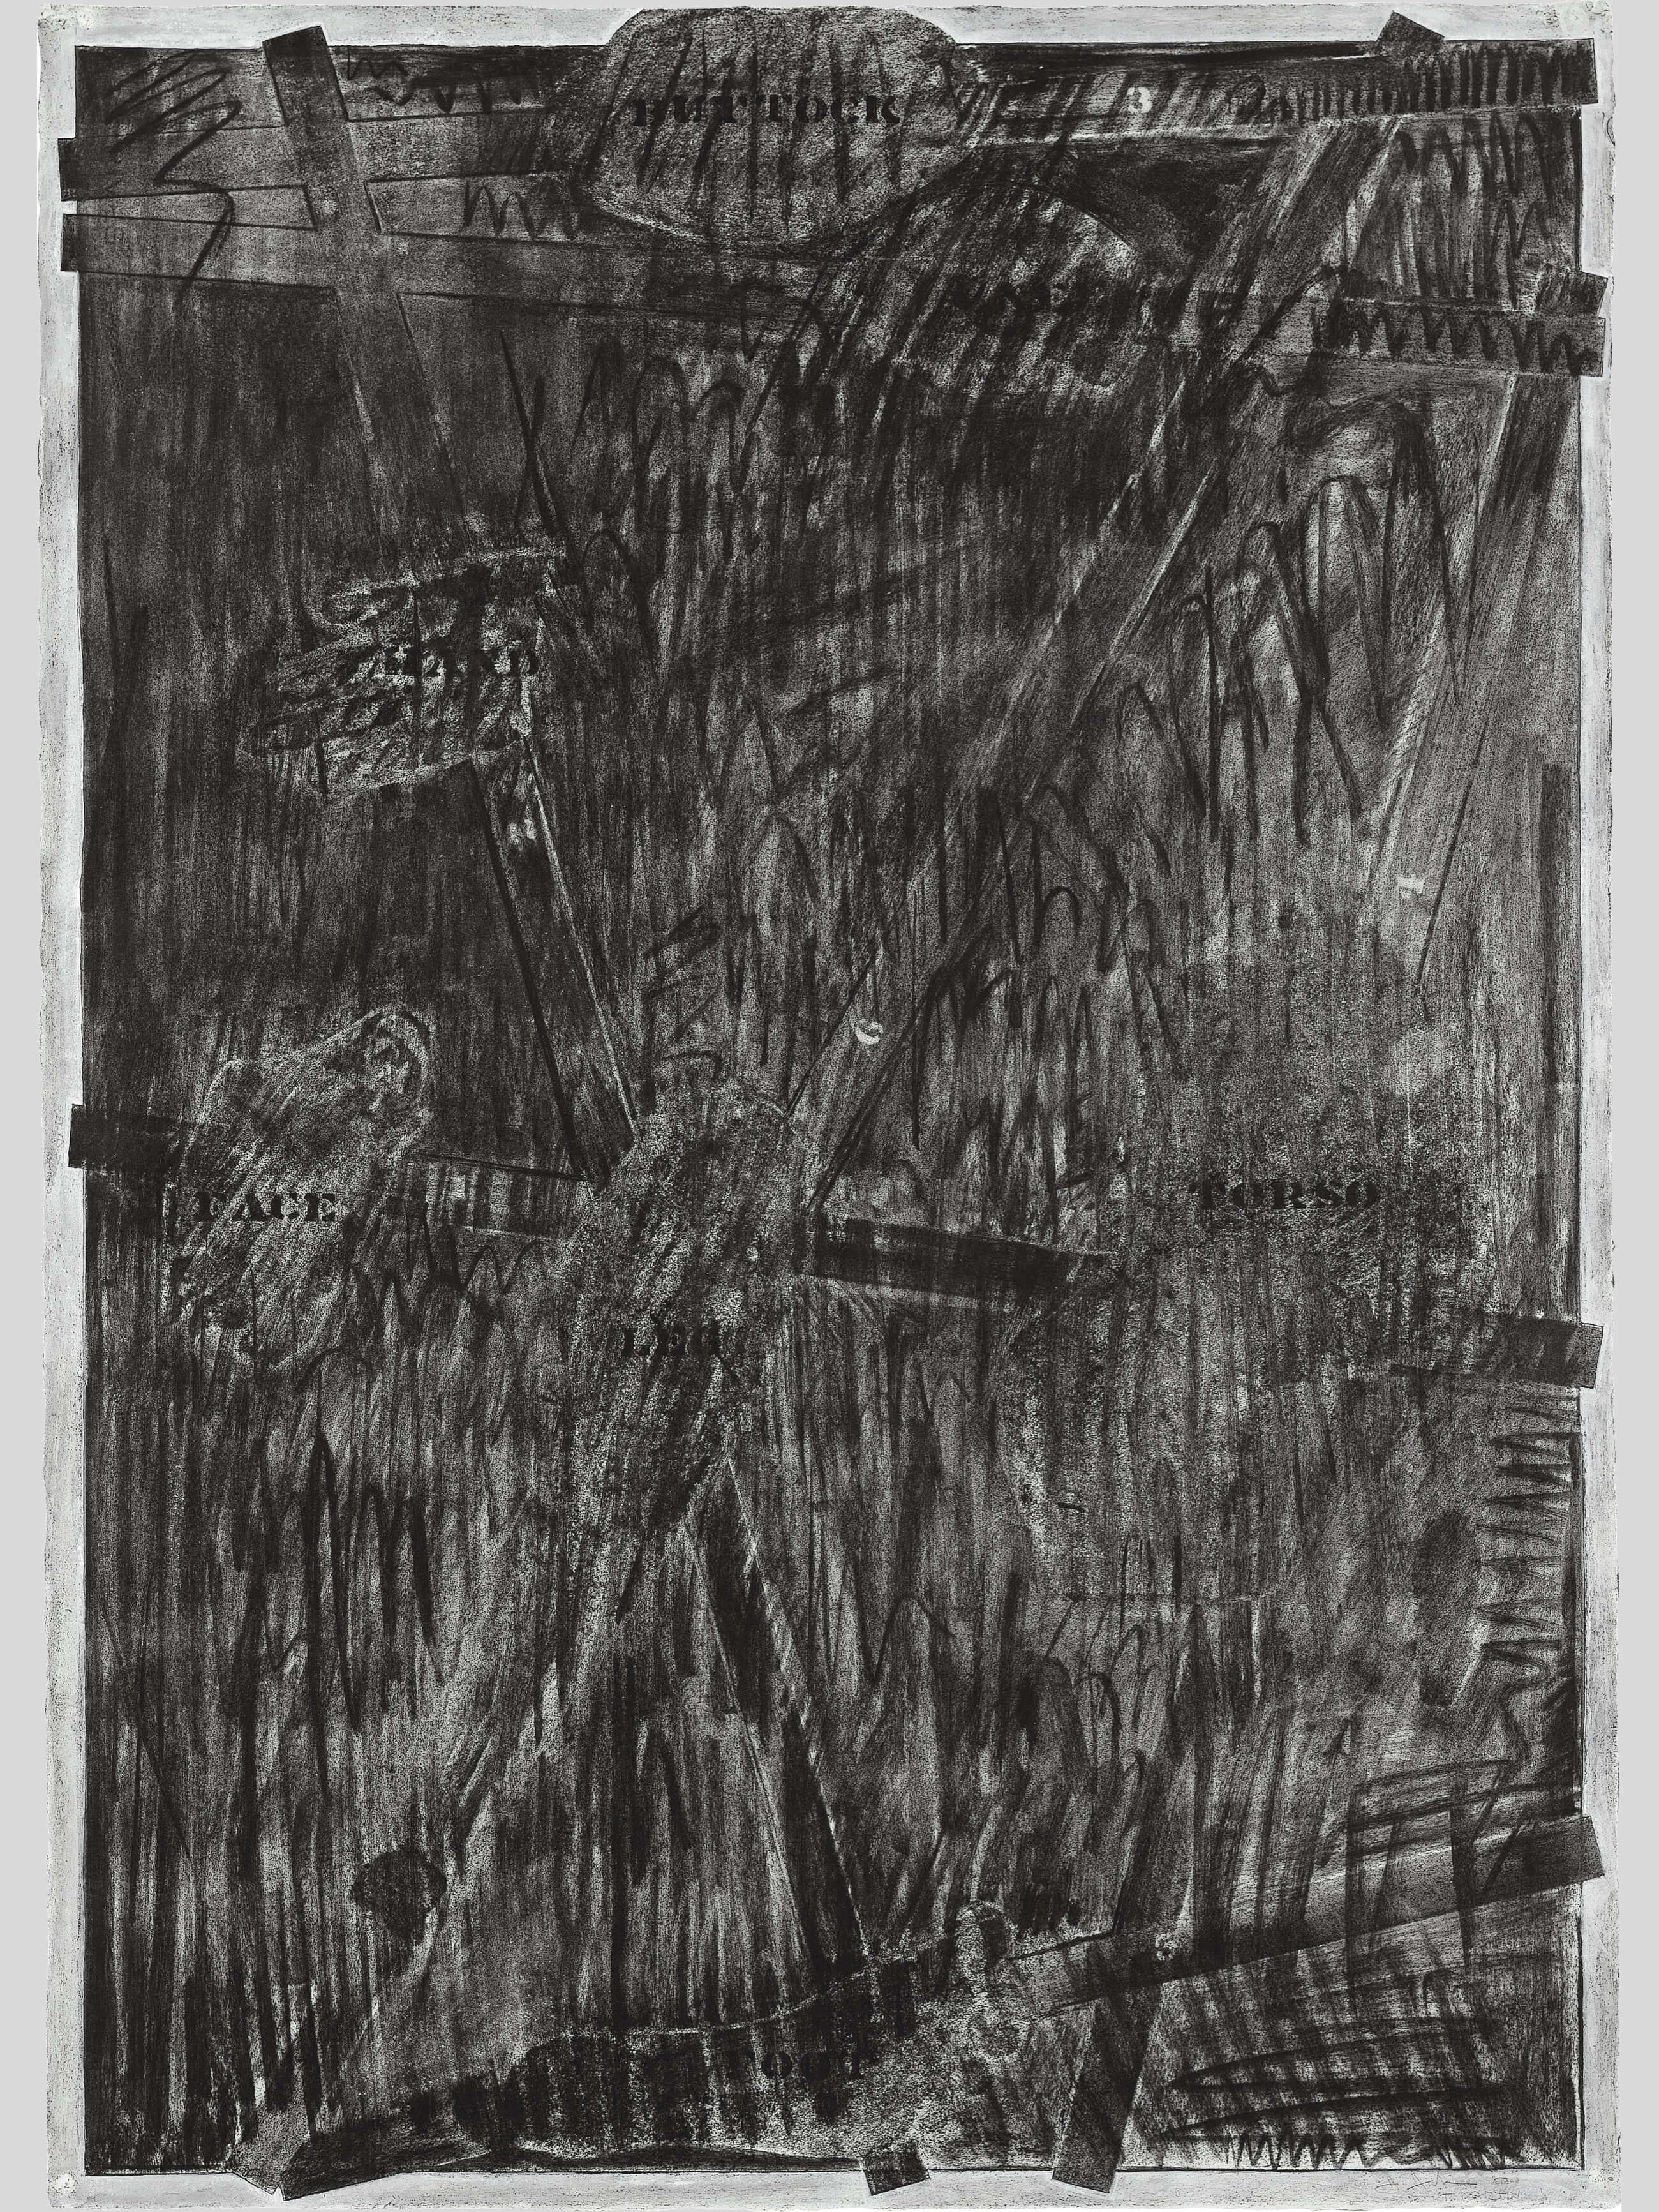 Untitled, 1973, by Jasper Johns